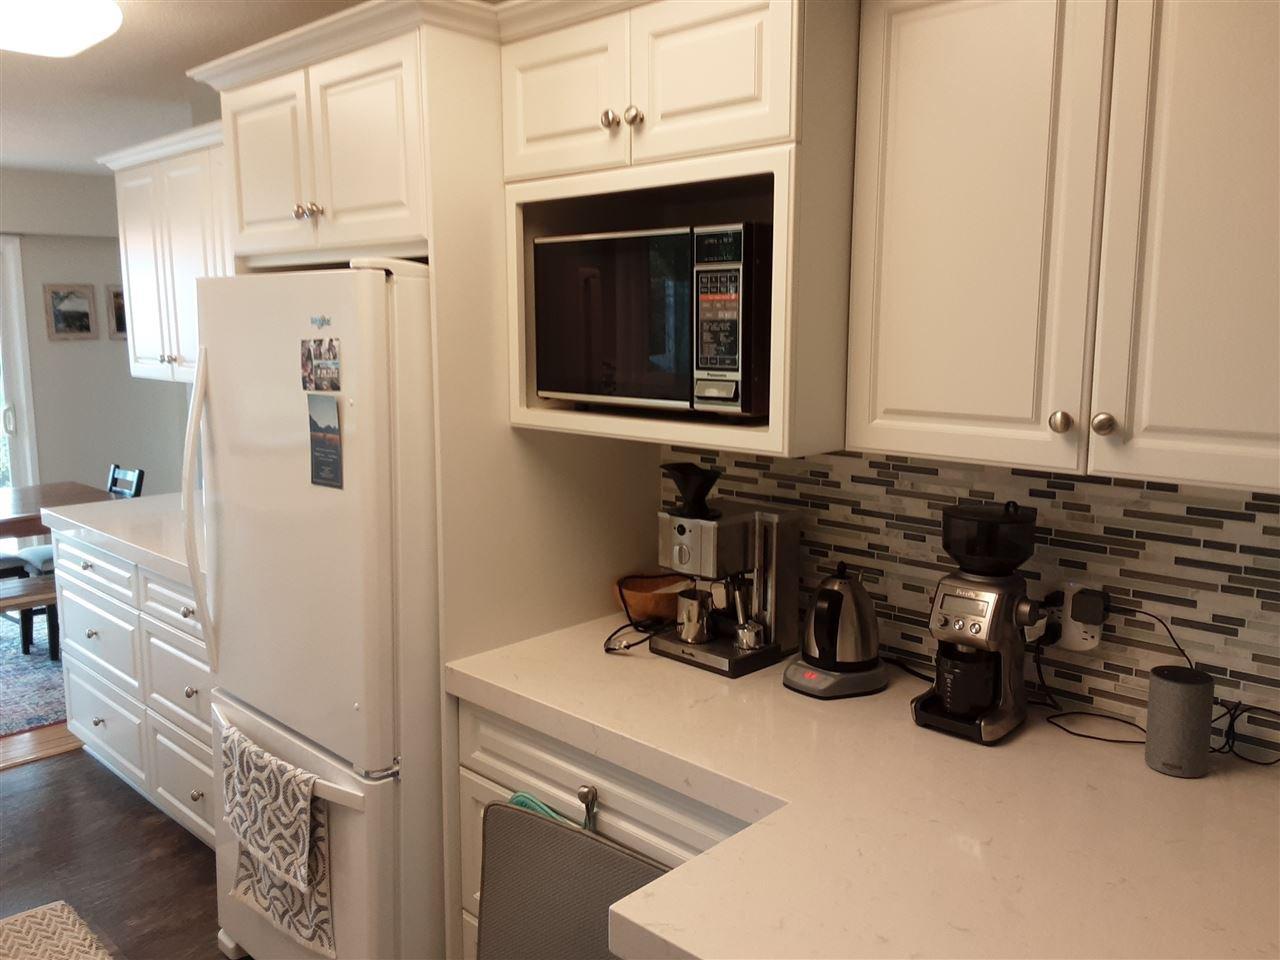 Photo 5: Photos: 15291 COLUMBIA Avenue: White Rock House for sale (South Surrey White Rock)  : MLS®# R2492863